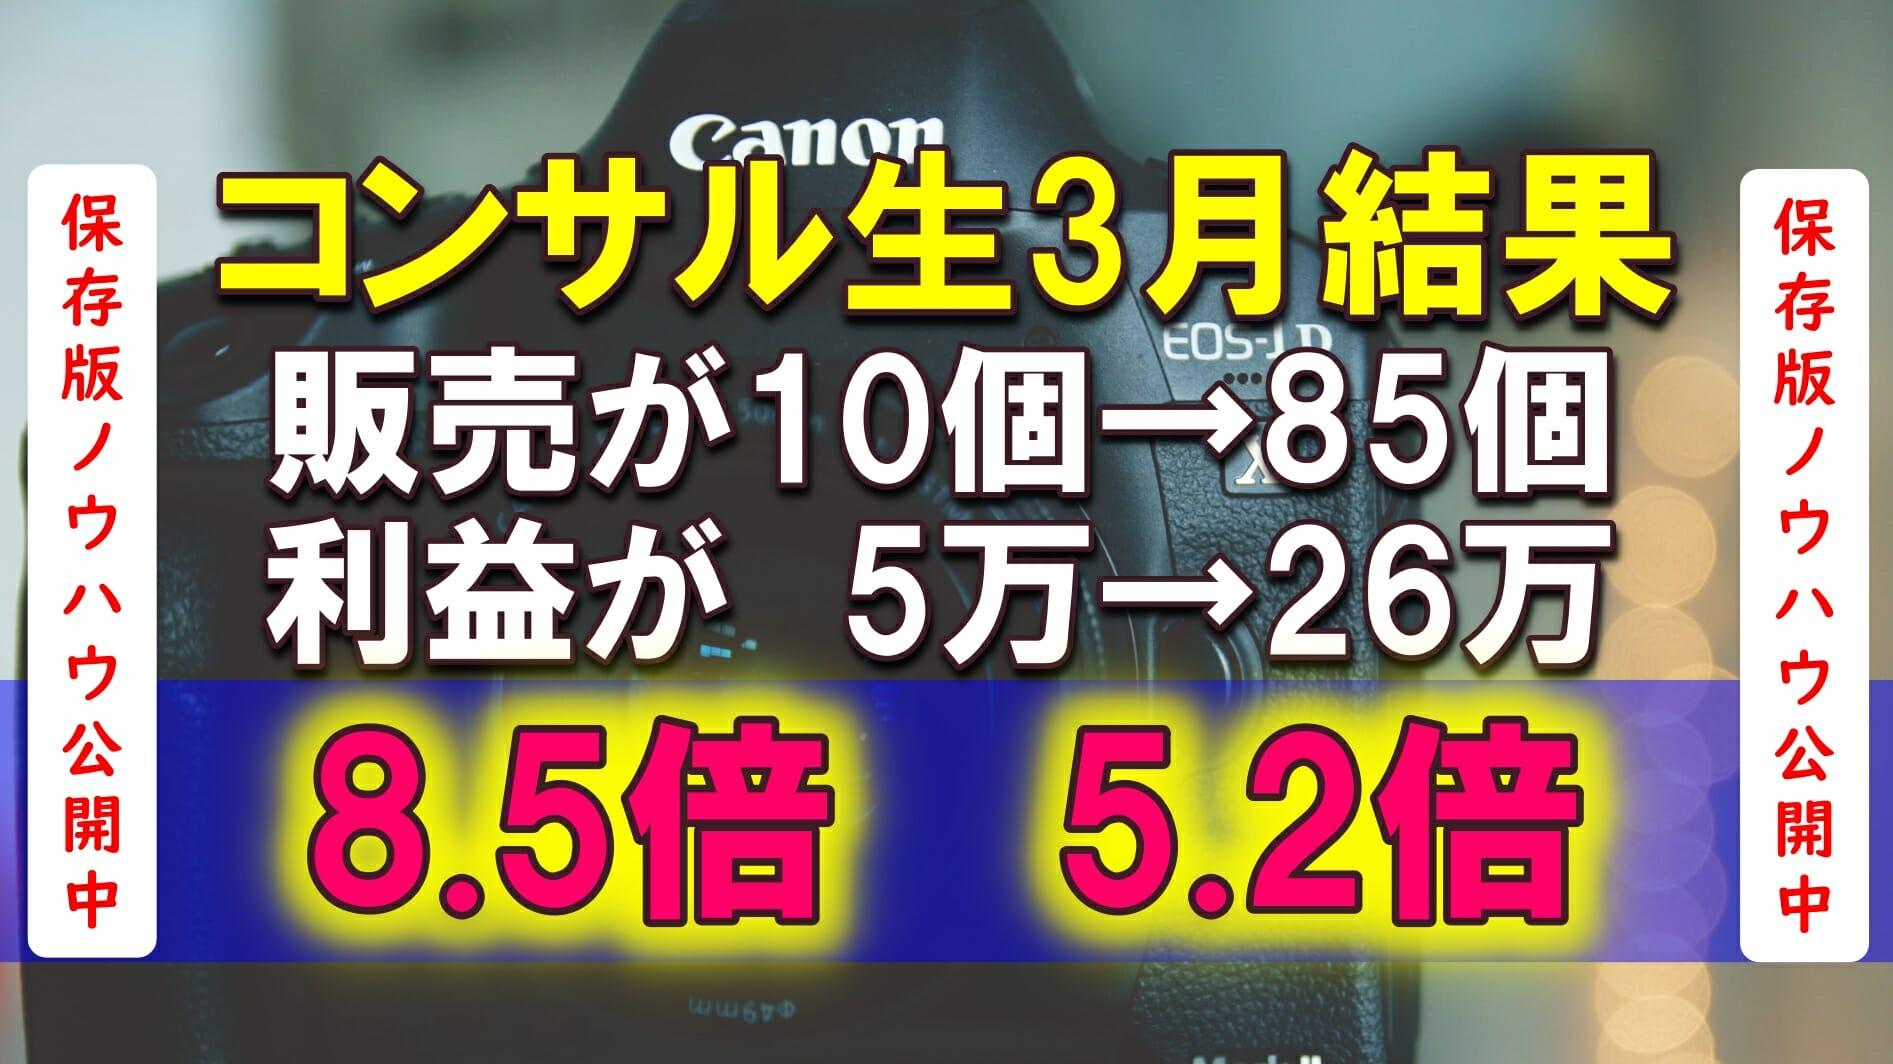 【ebay カメラ輸出転売(保存版)】ノウハウ暴露!コンサル3ヶ月目で出品40個で販売10個→85個、利益5万→26万に!